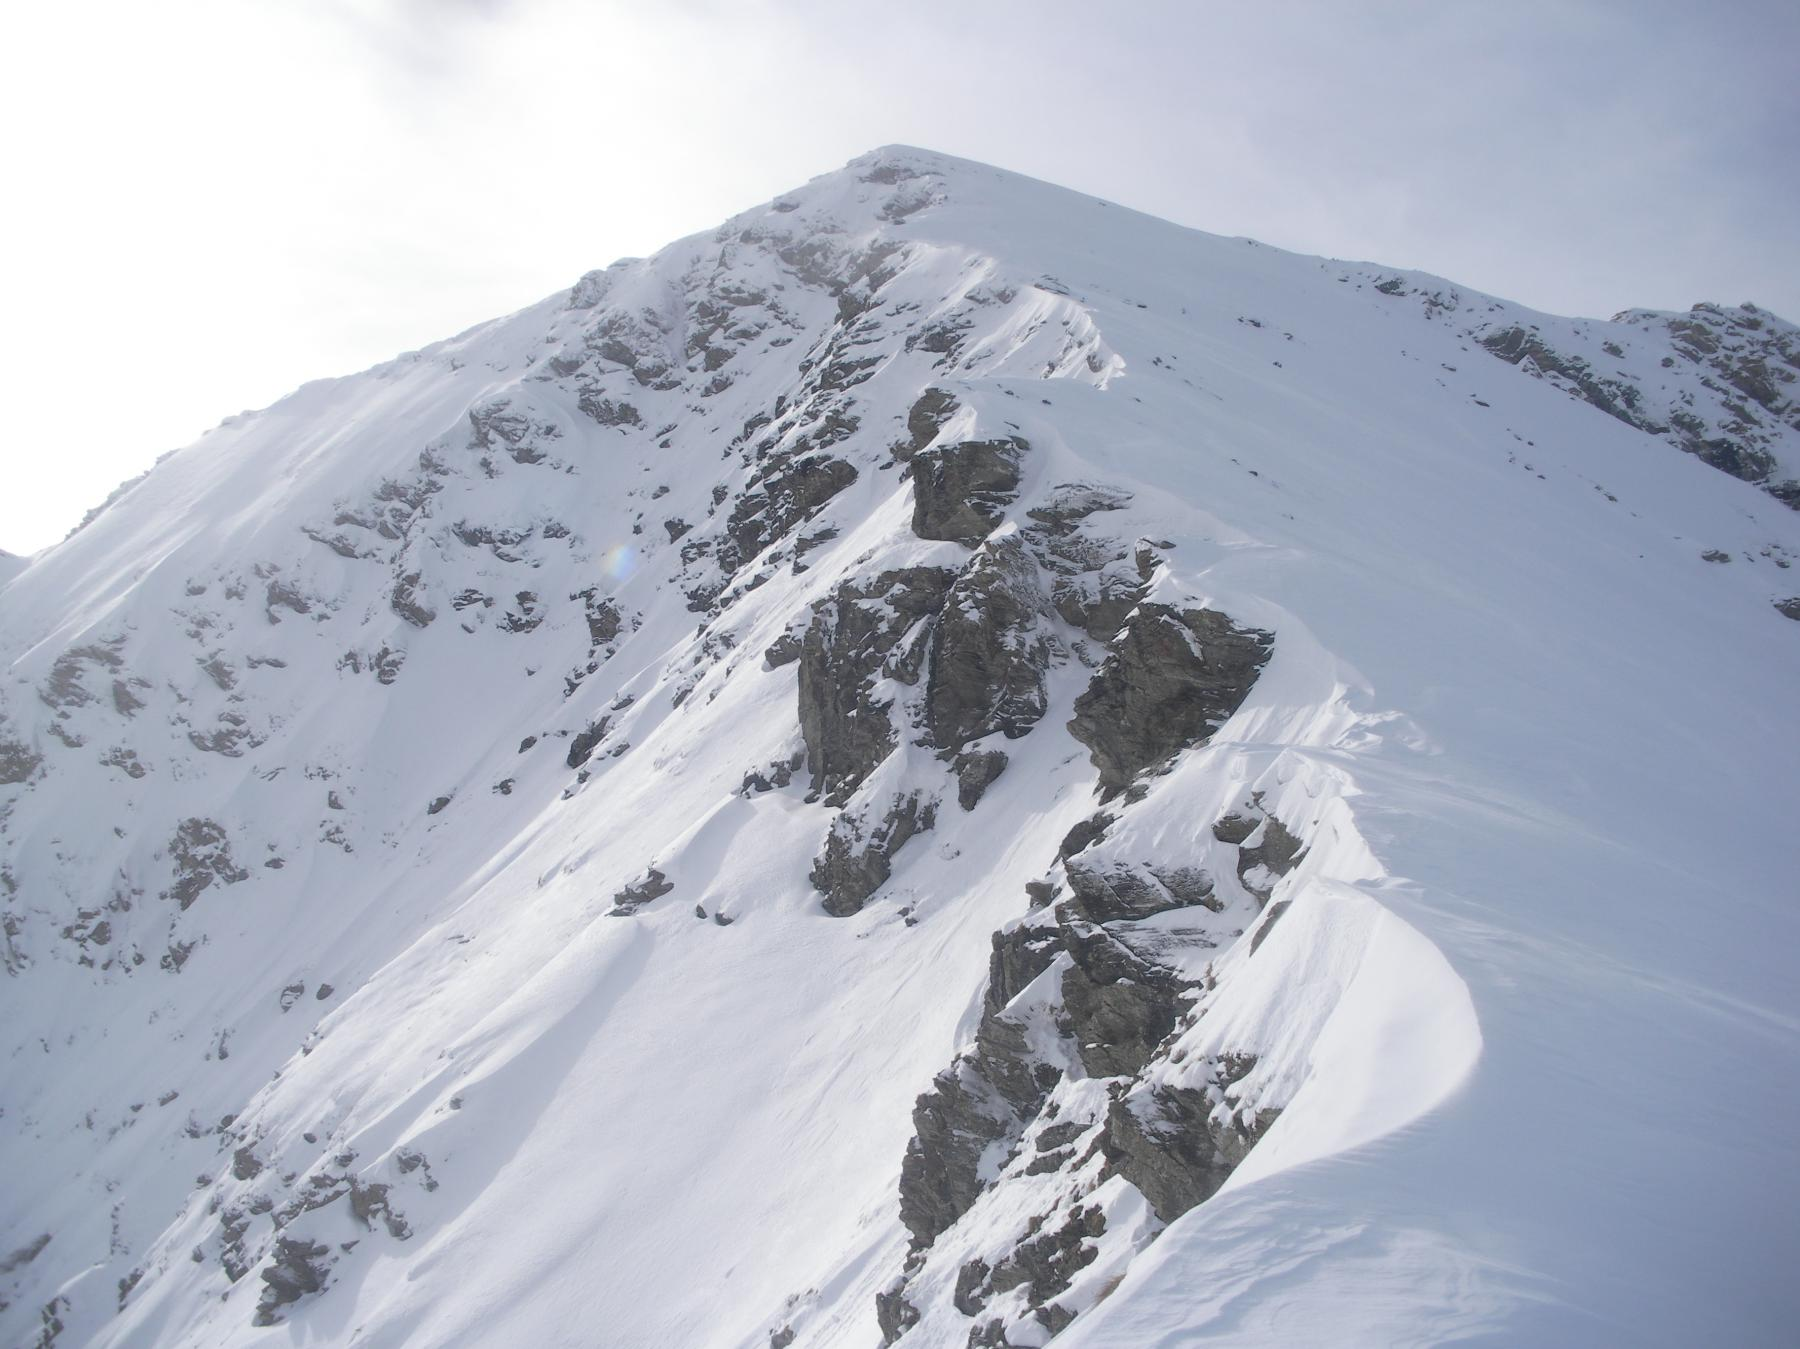 Cialancio d'Ane quota 2784 m da Laux, pendio nord 2014-12-08